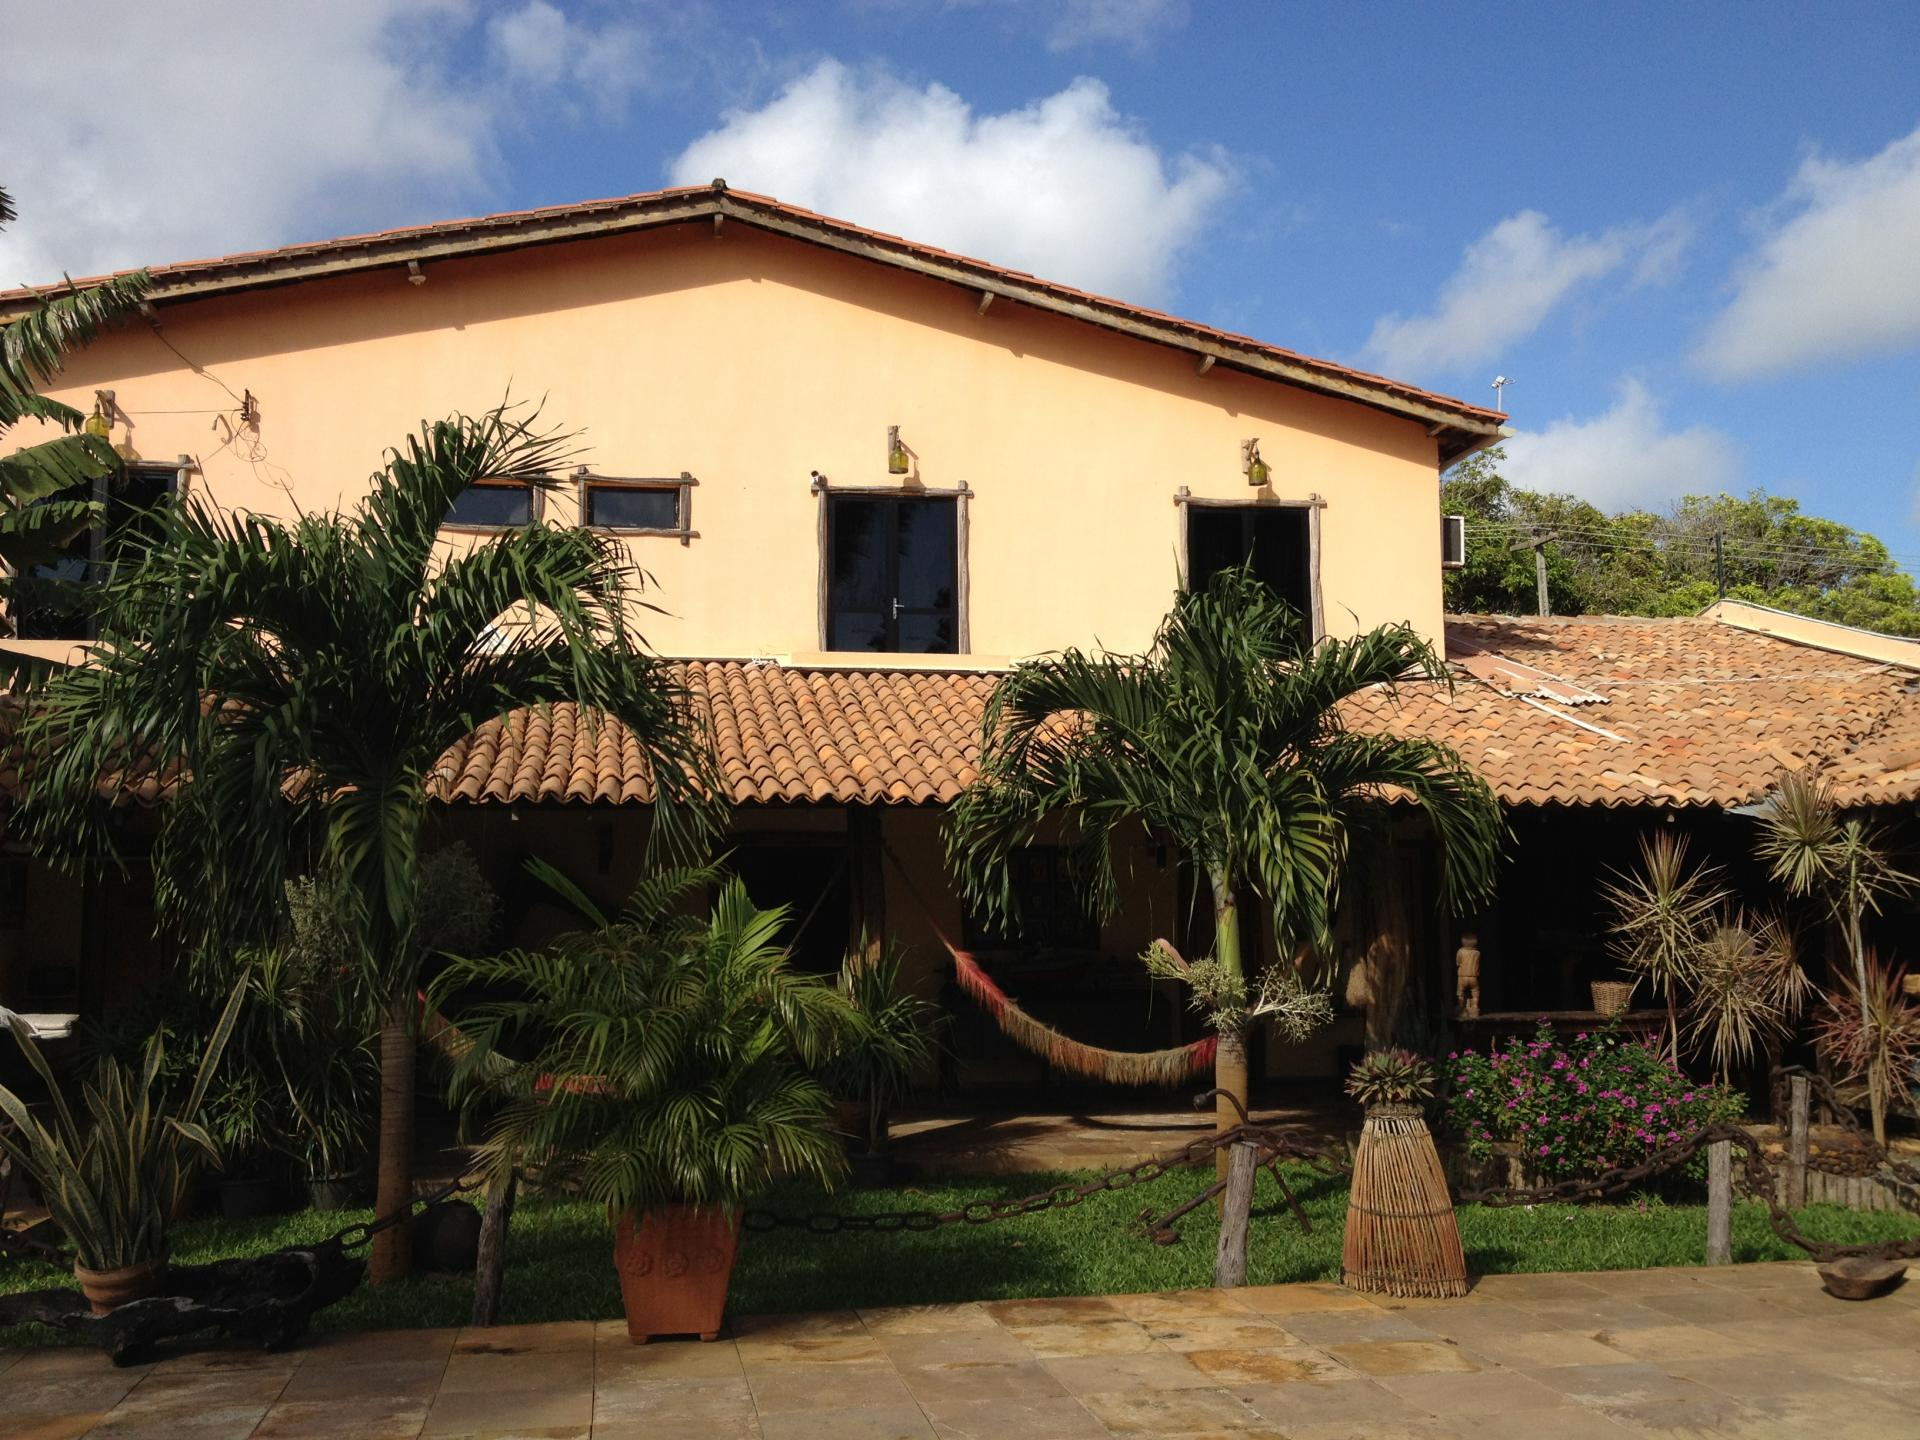 External view on the entrance area of Pousada Vila Parnaiba